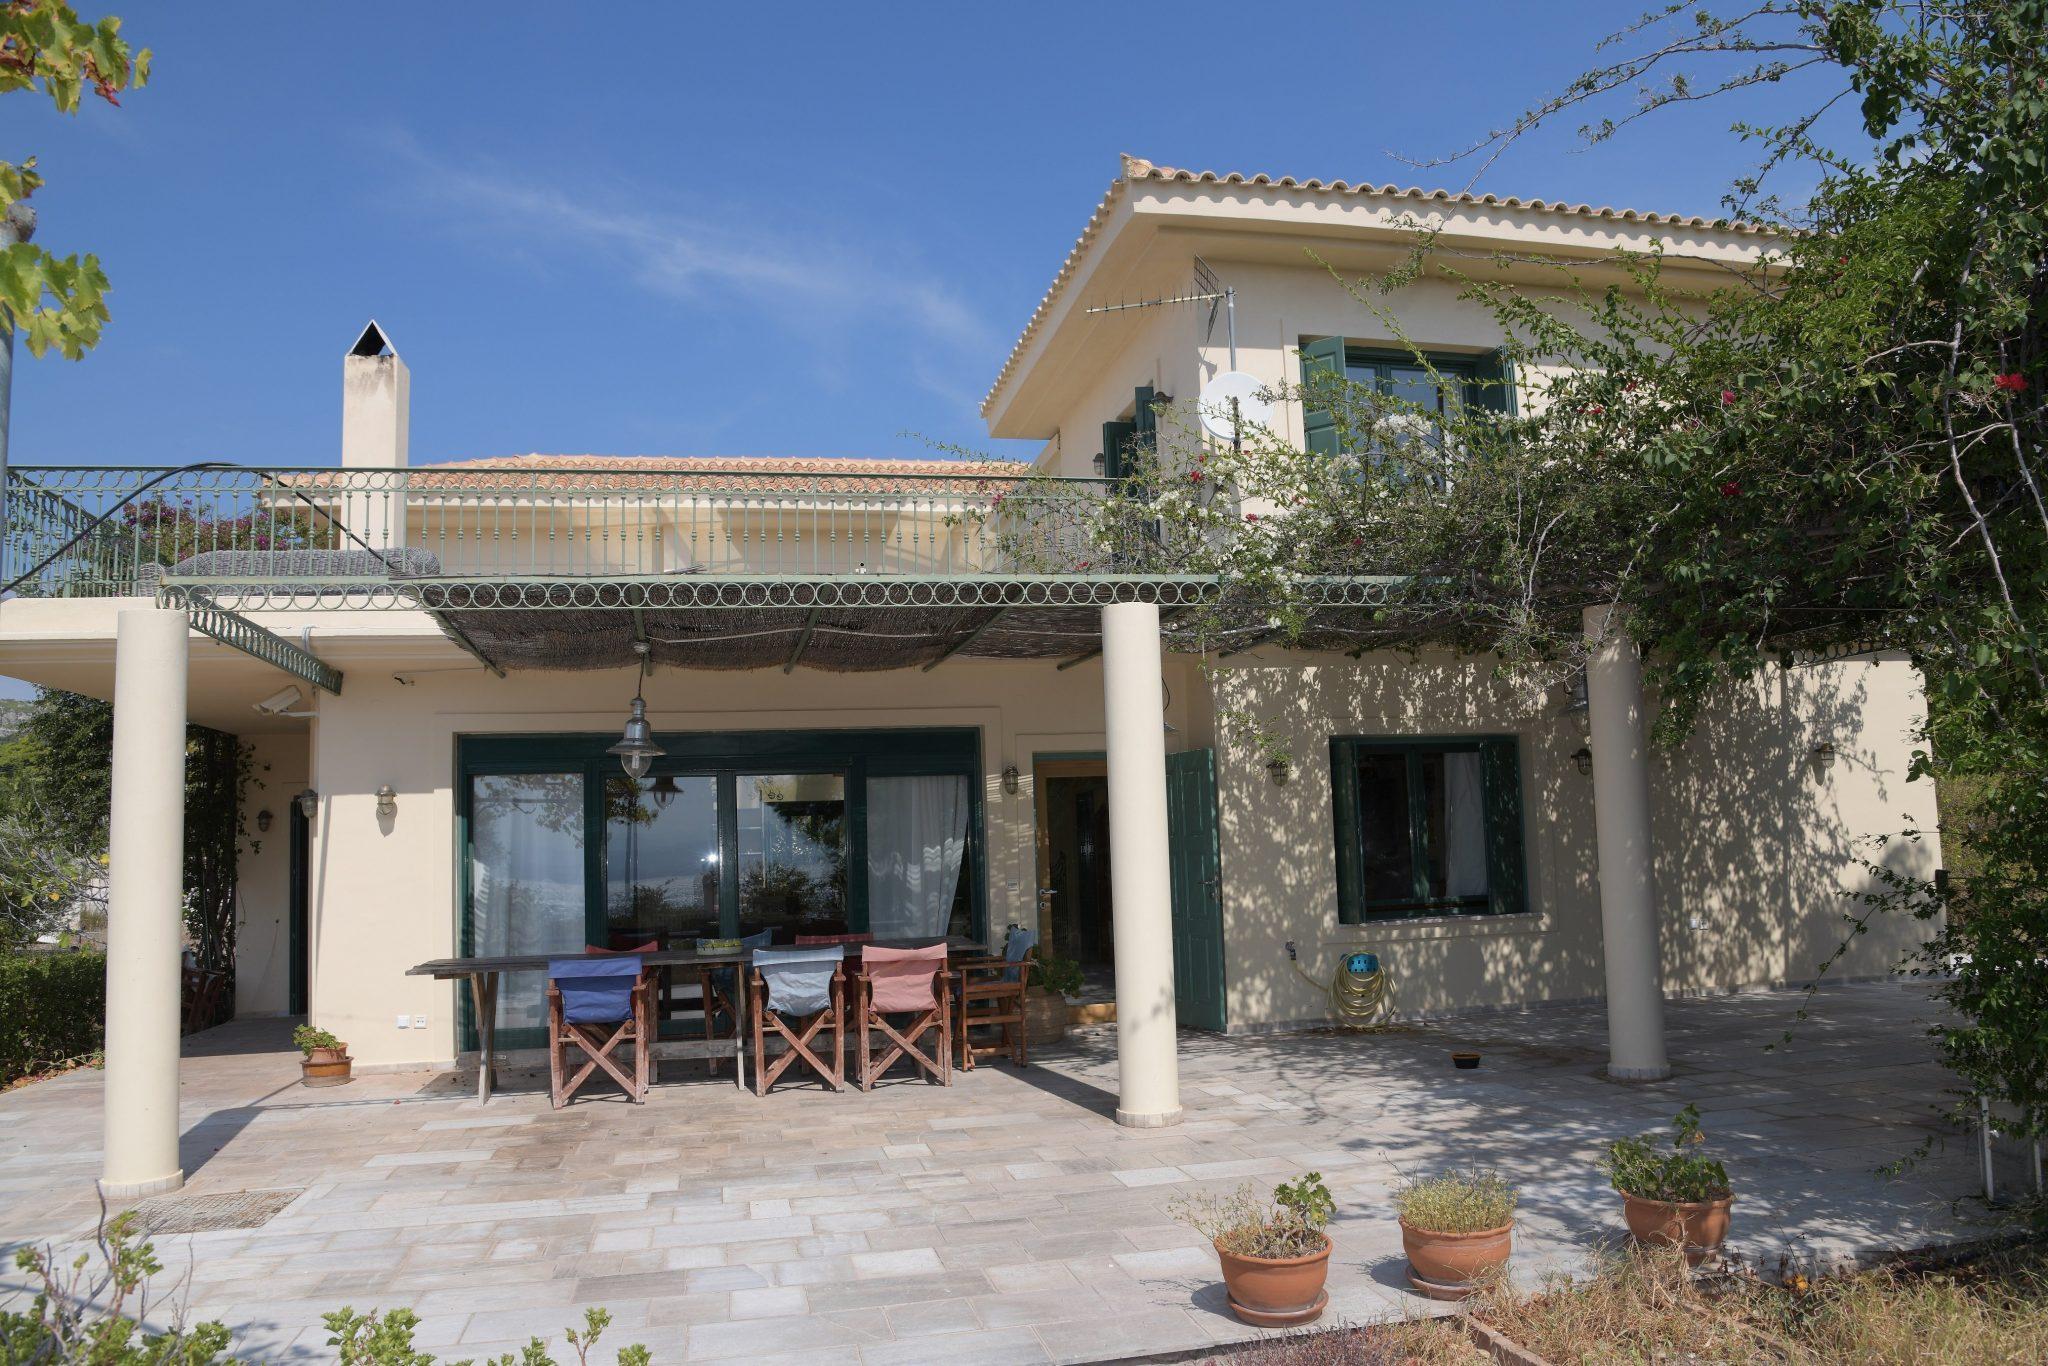 Casa, Corinthia - Ref GR-5442